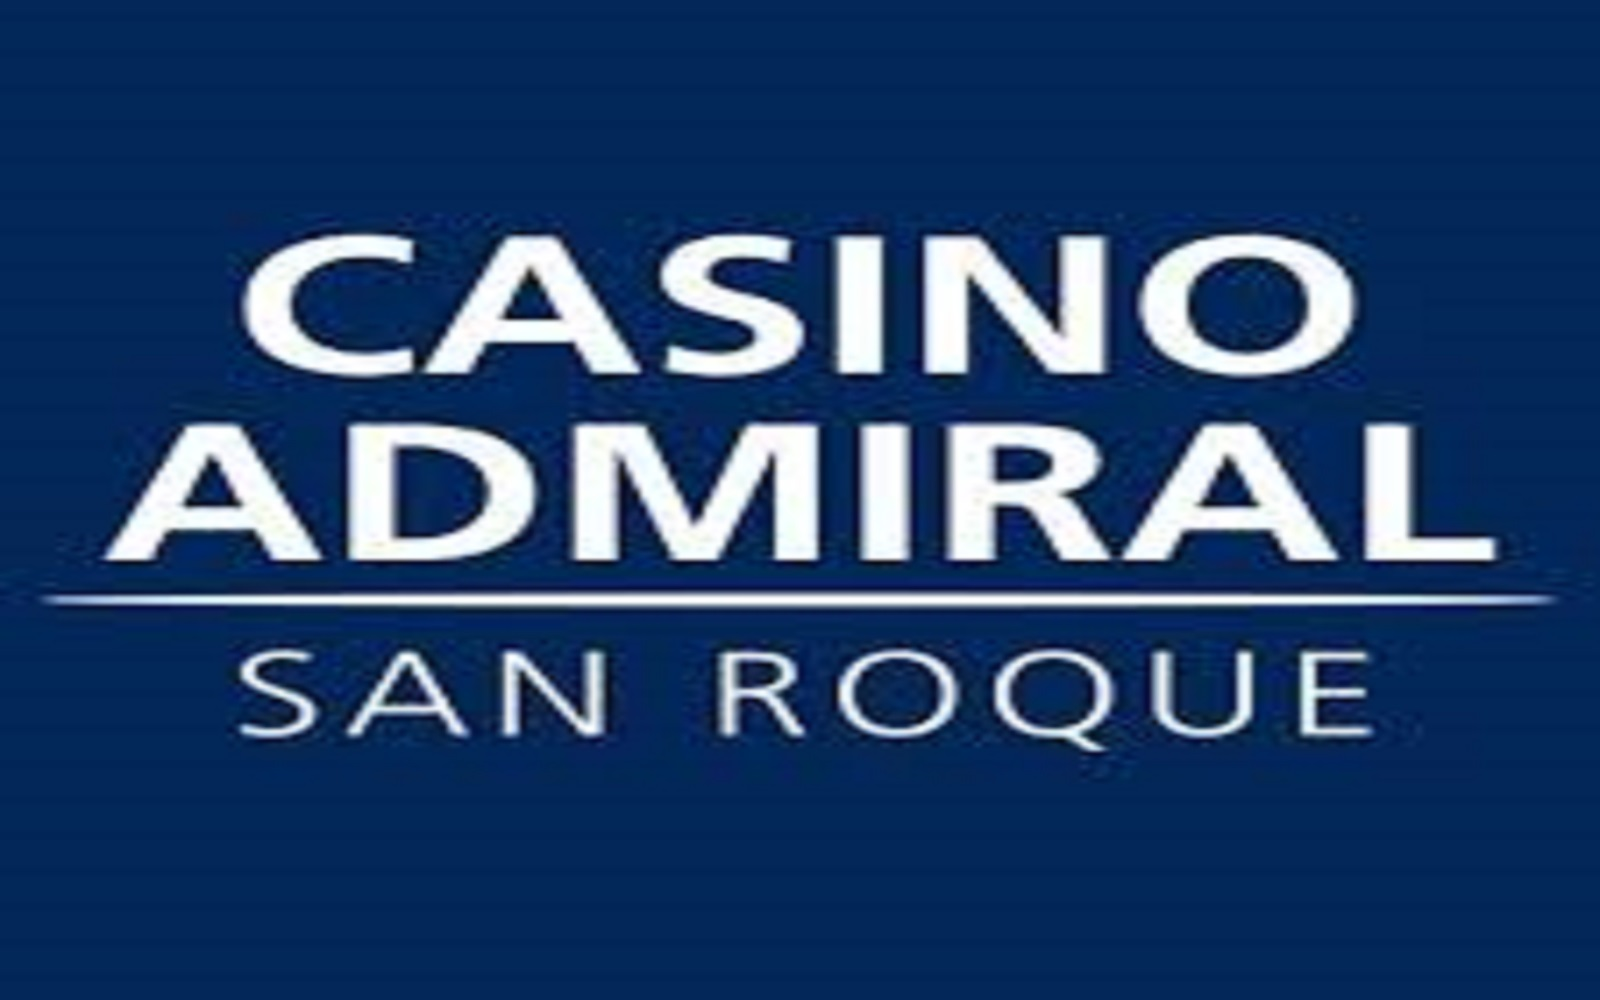 Admiral San Roque